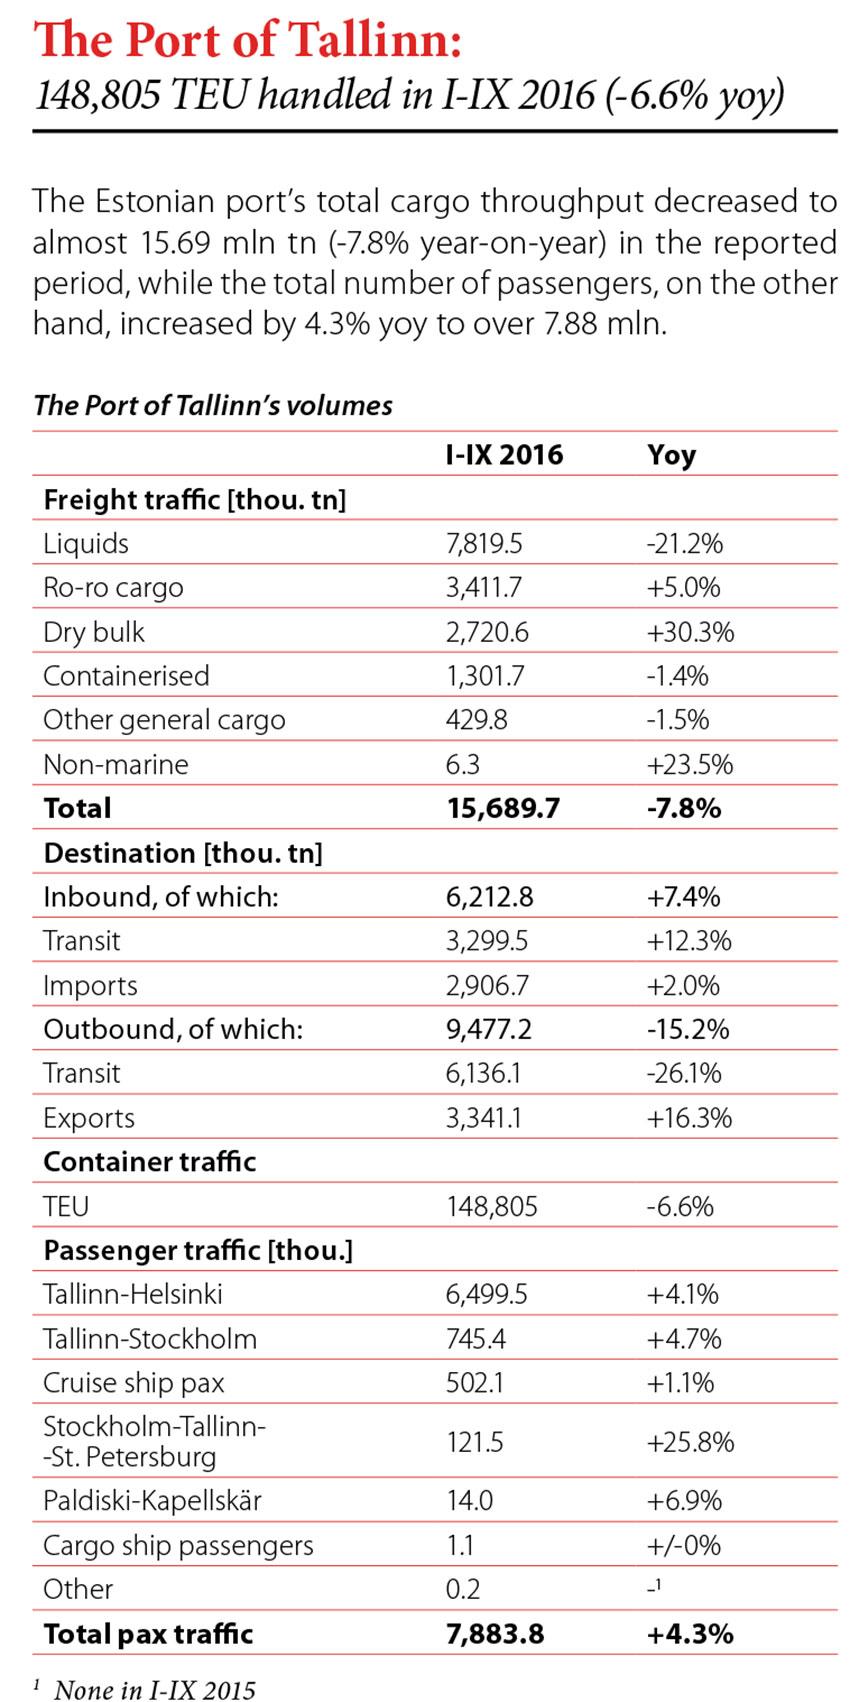 The Port of Tallinn: 148,805 TEU handled in I-IX 2016 (-6.6% yoy) // Baltic Transport Journal. - 2016, nr 5, s. 8. - Tab.